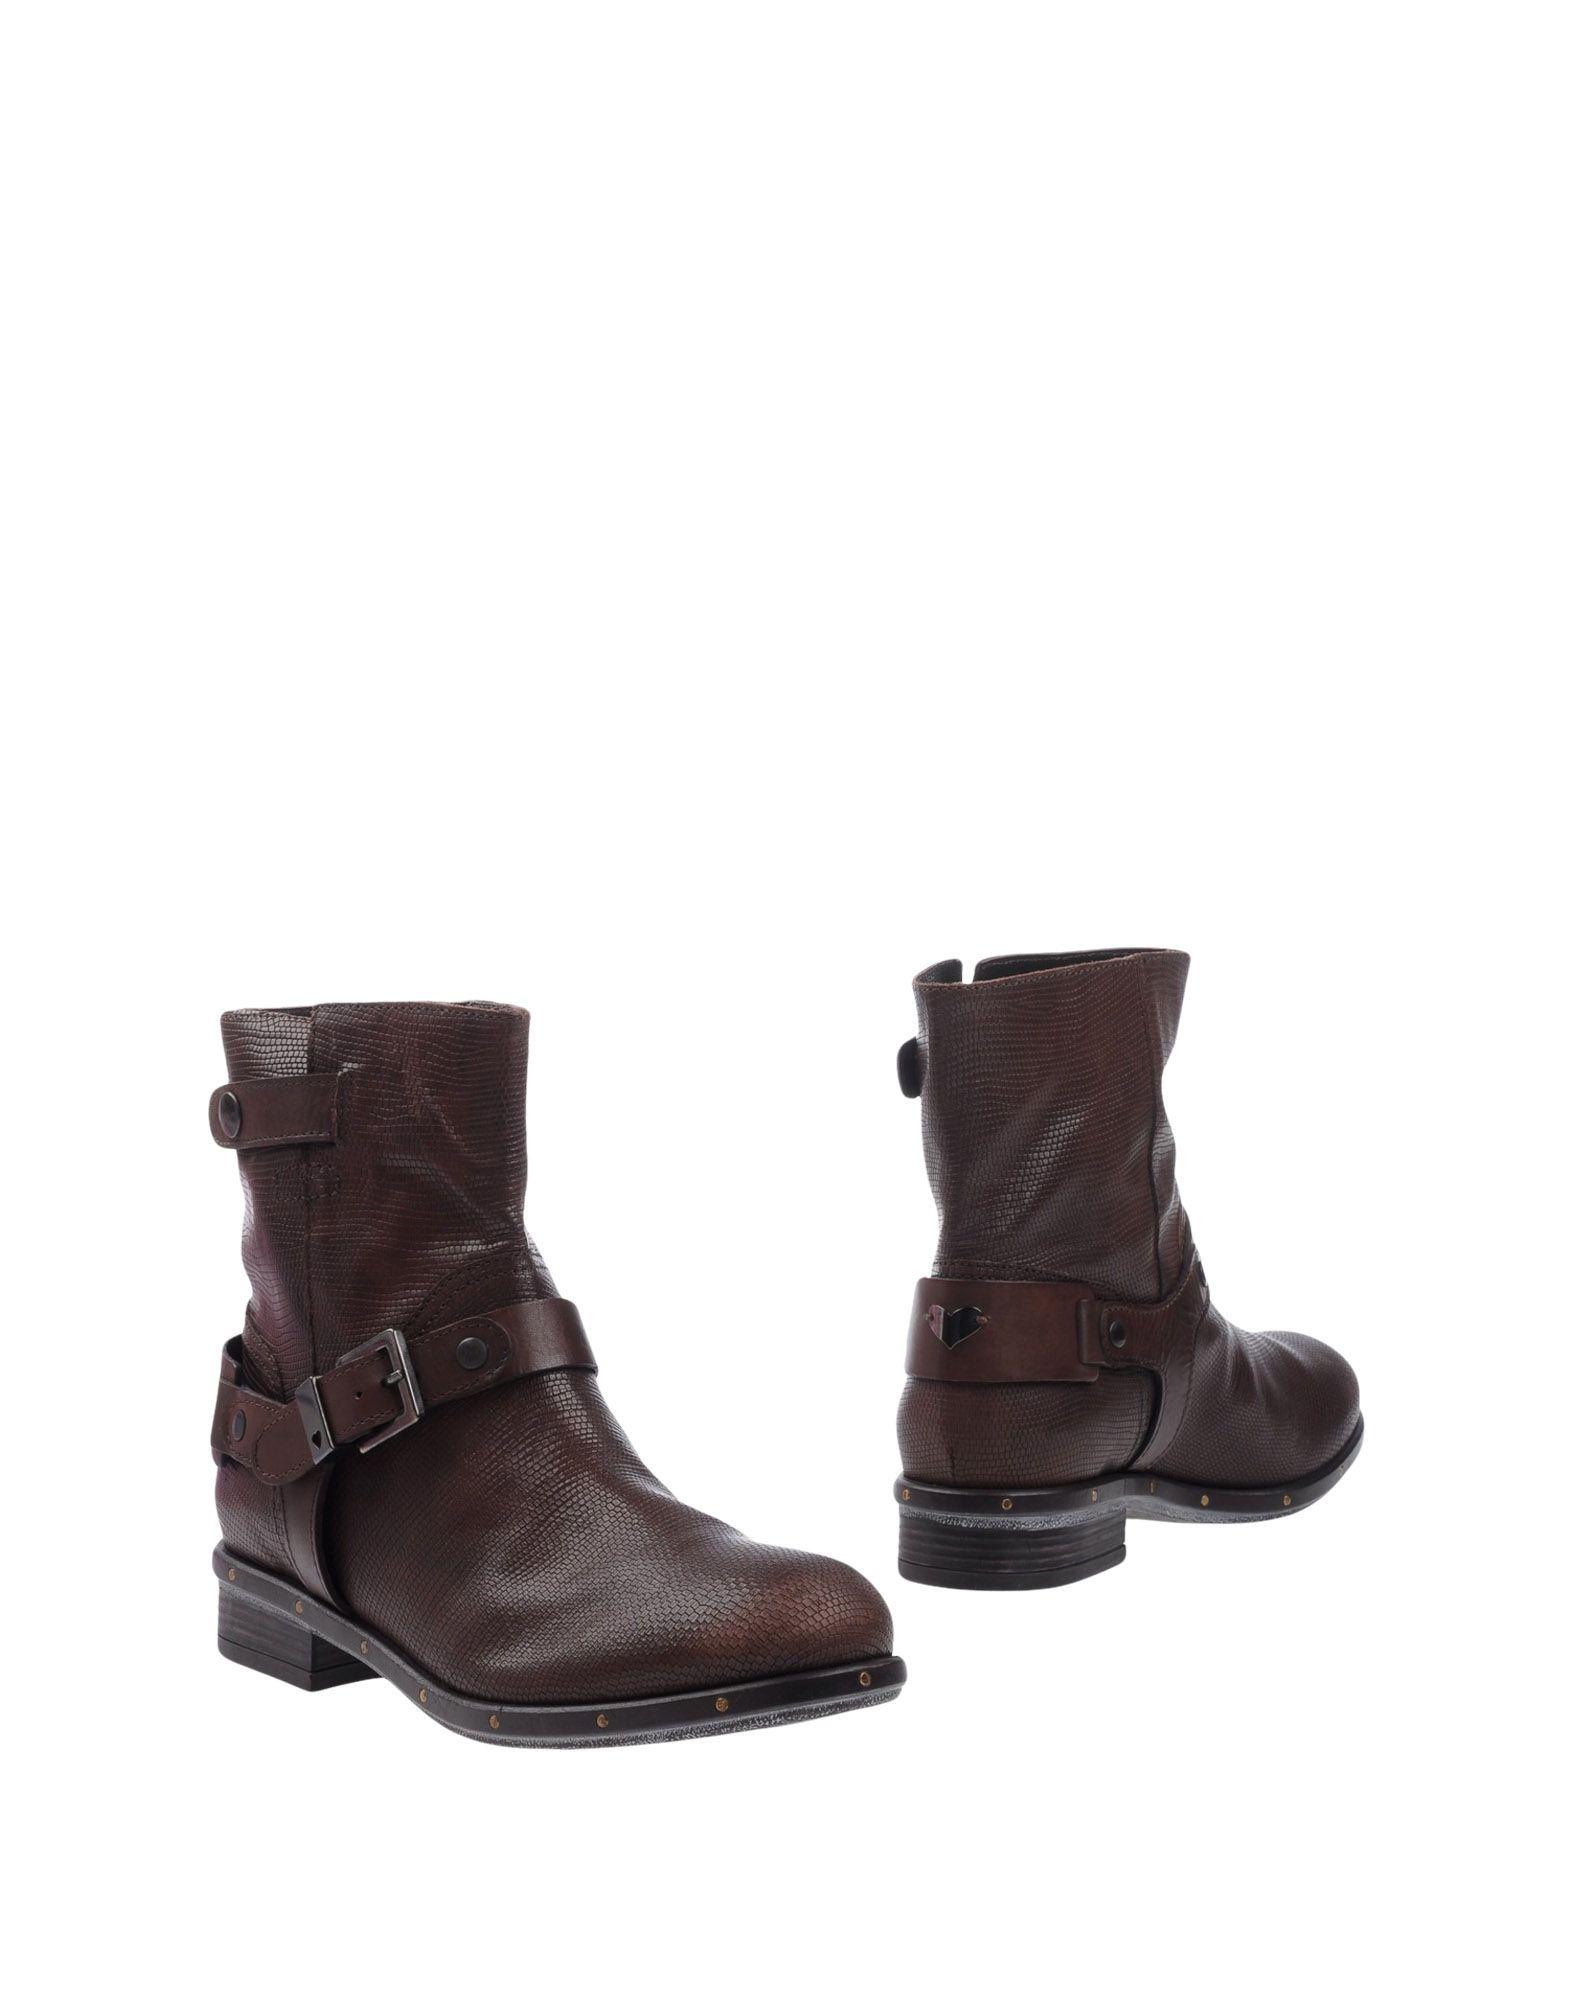 Twin-Set Simona Barbieri Ankle Boot - Women Twin-Set Simona on Barbieri Ankle Boots online on Simona  United Kingdom - 11242793GB 6a9e32